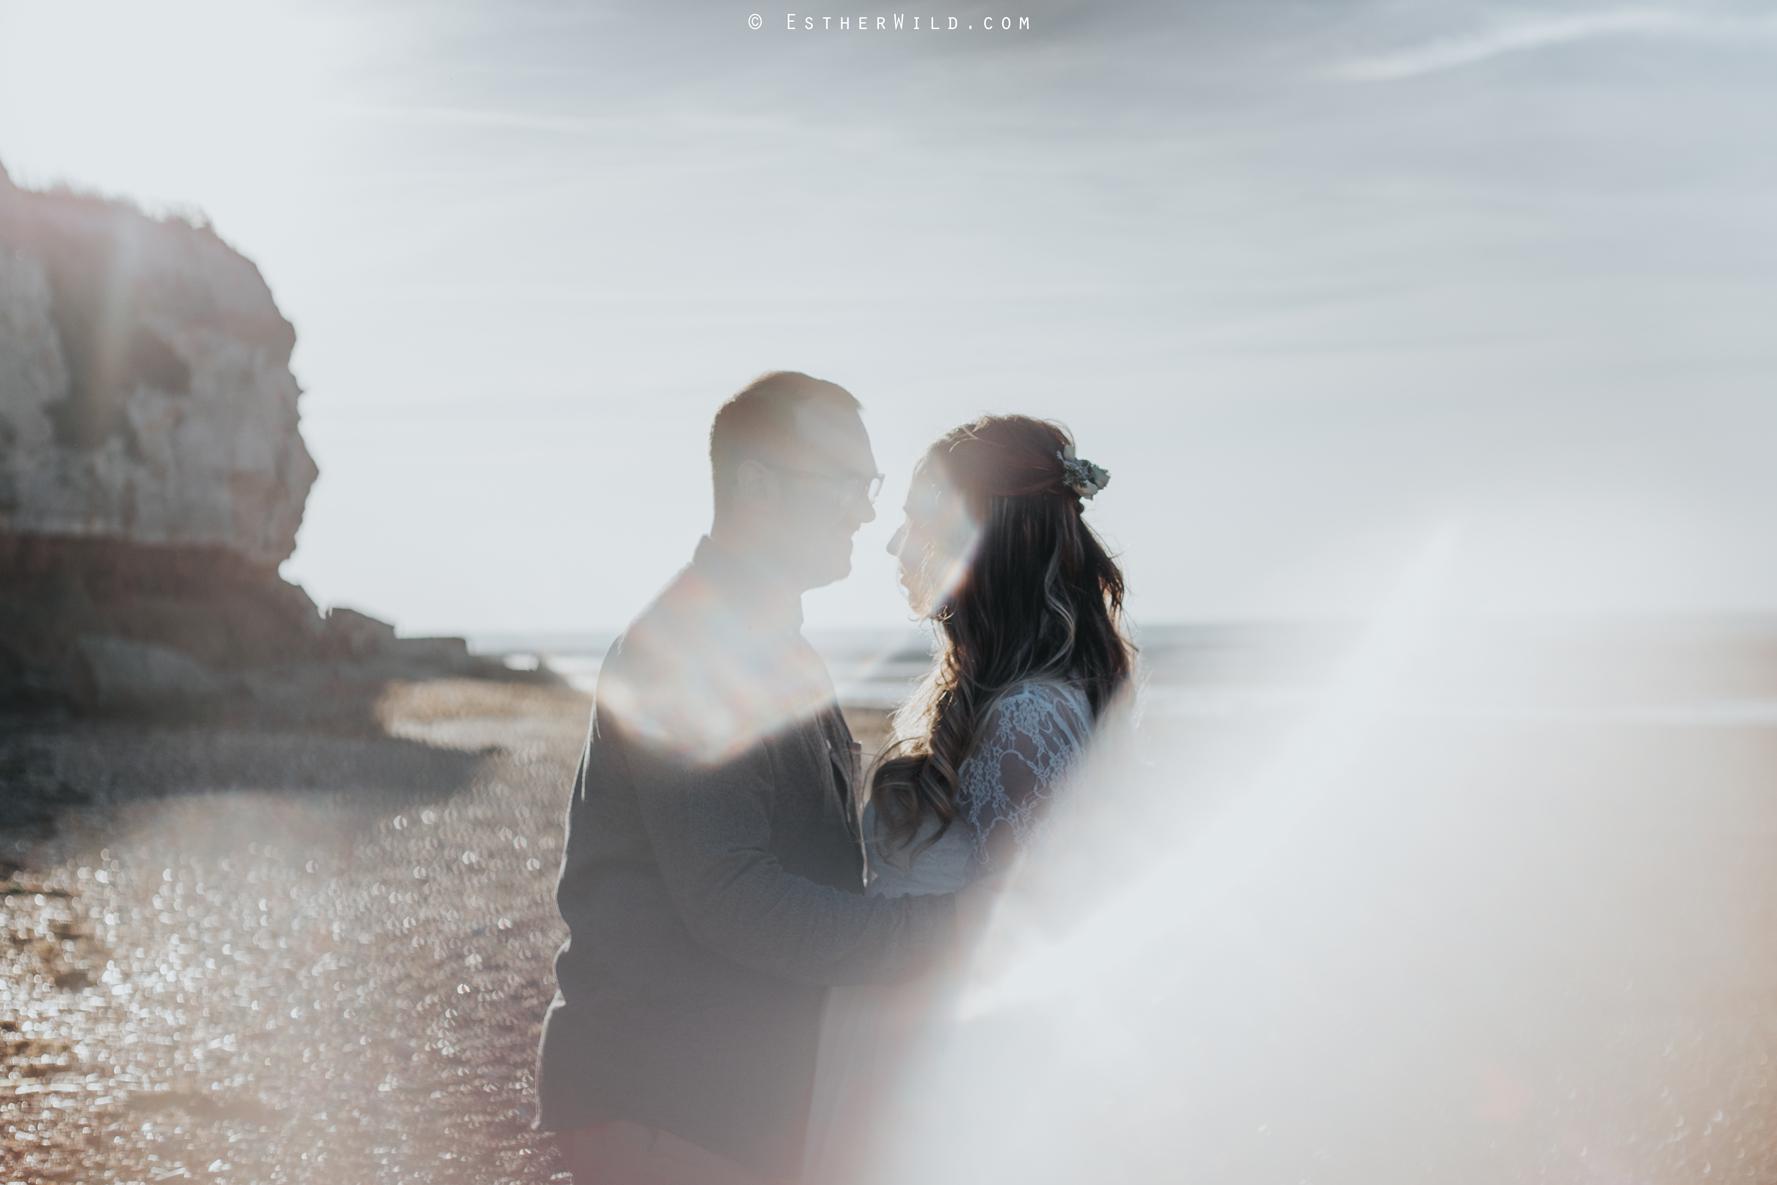 Couple_Anniversary_Wedding_Photography_Hunstanton_Norfolk_Esther_Wild_Share_Copy_IMG_8669.jpg